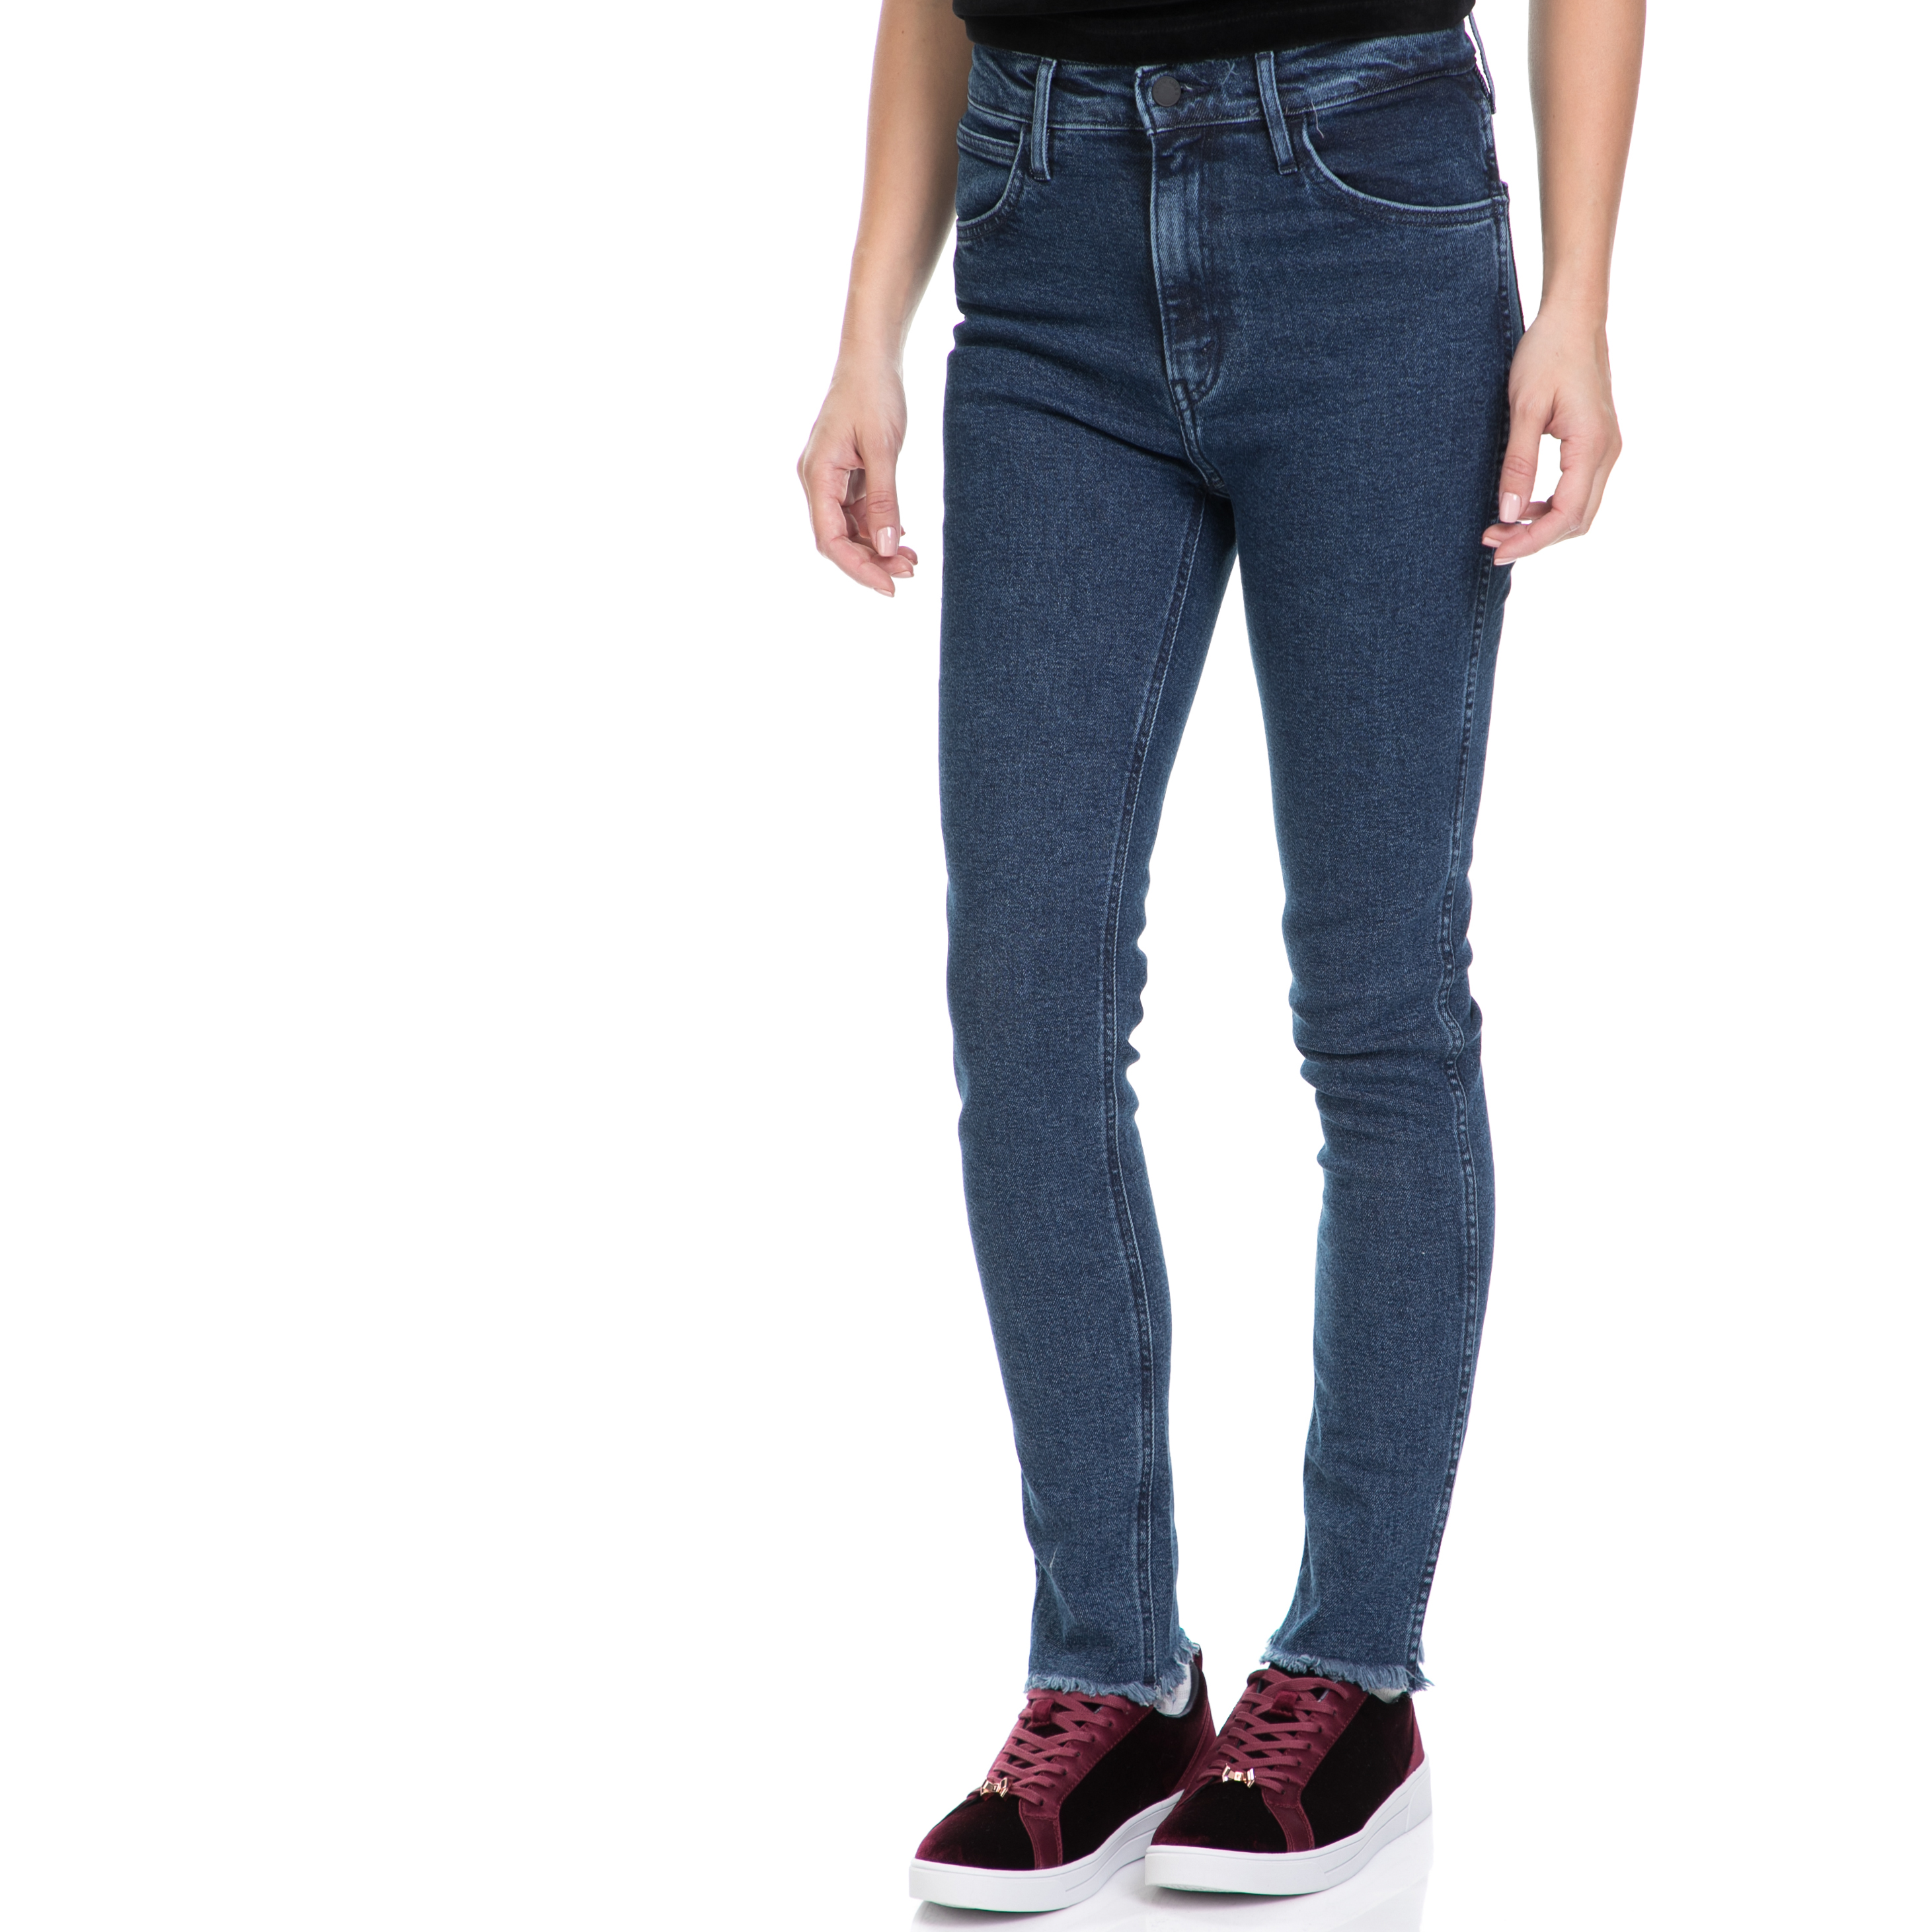 LEVI'S – Γυναικείο τζιν παντελόνι L8 HIGH SKINNY LEVI'S μπλε